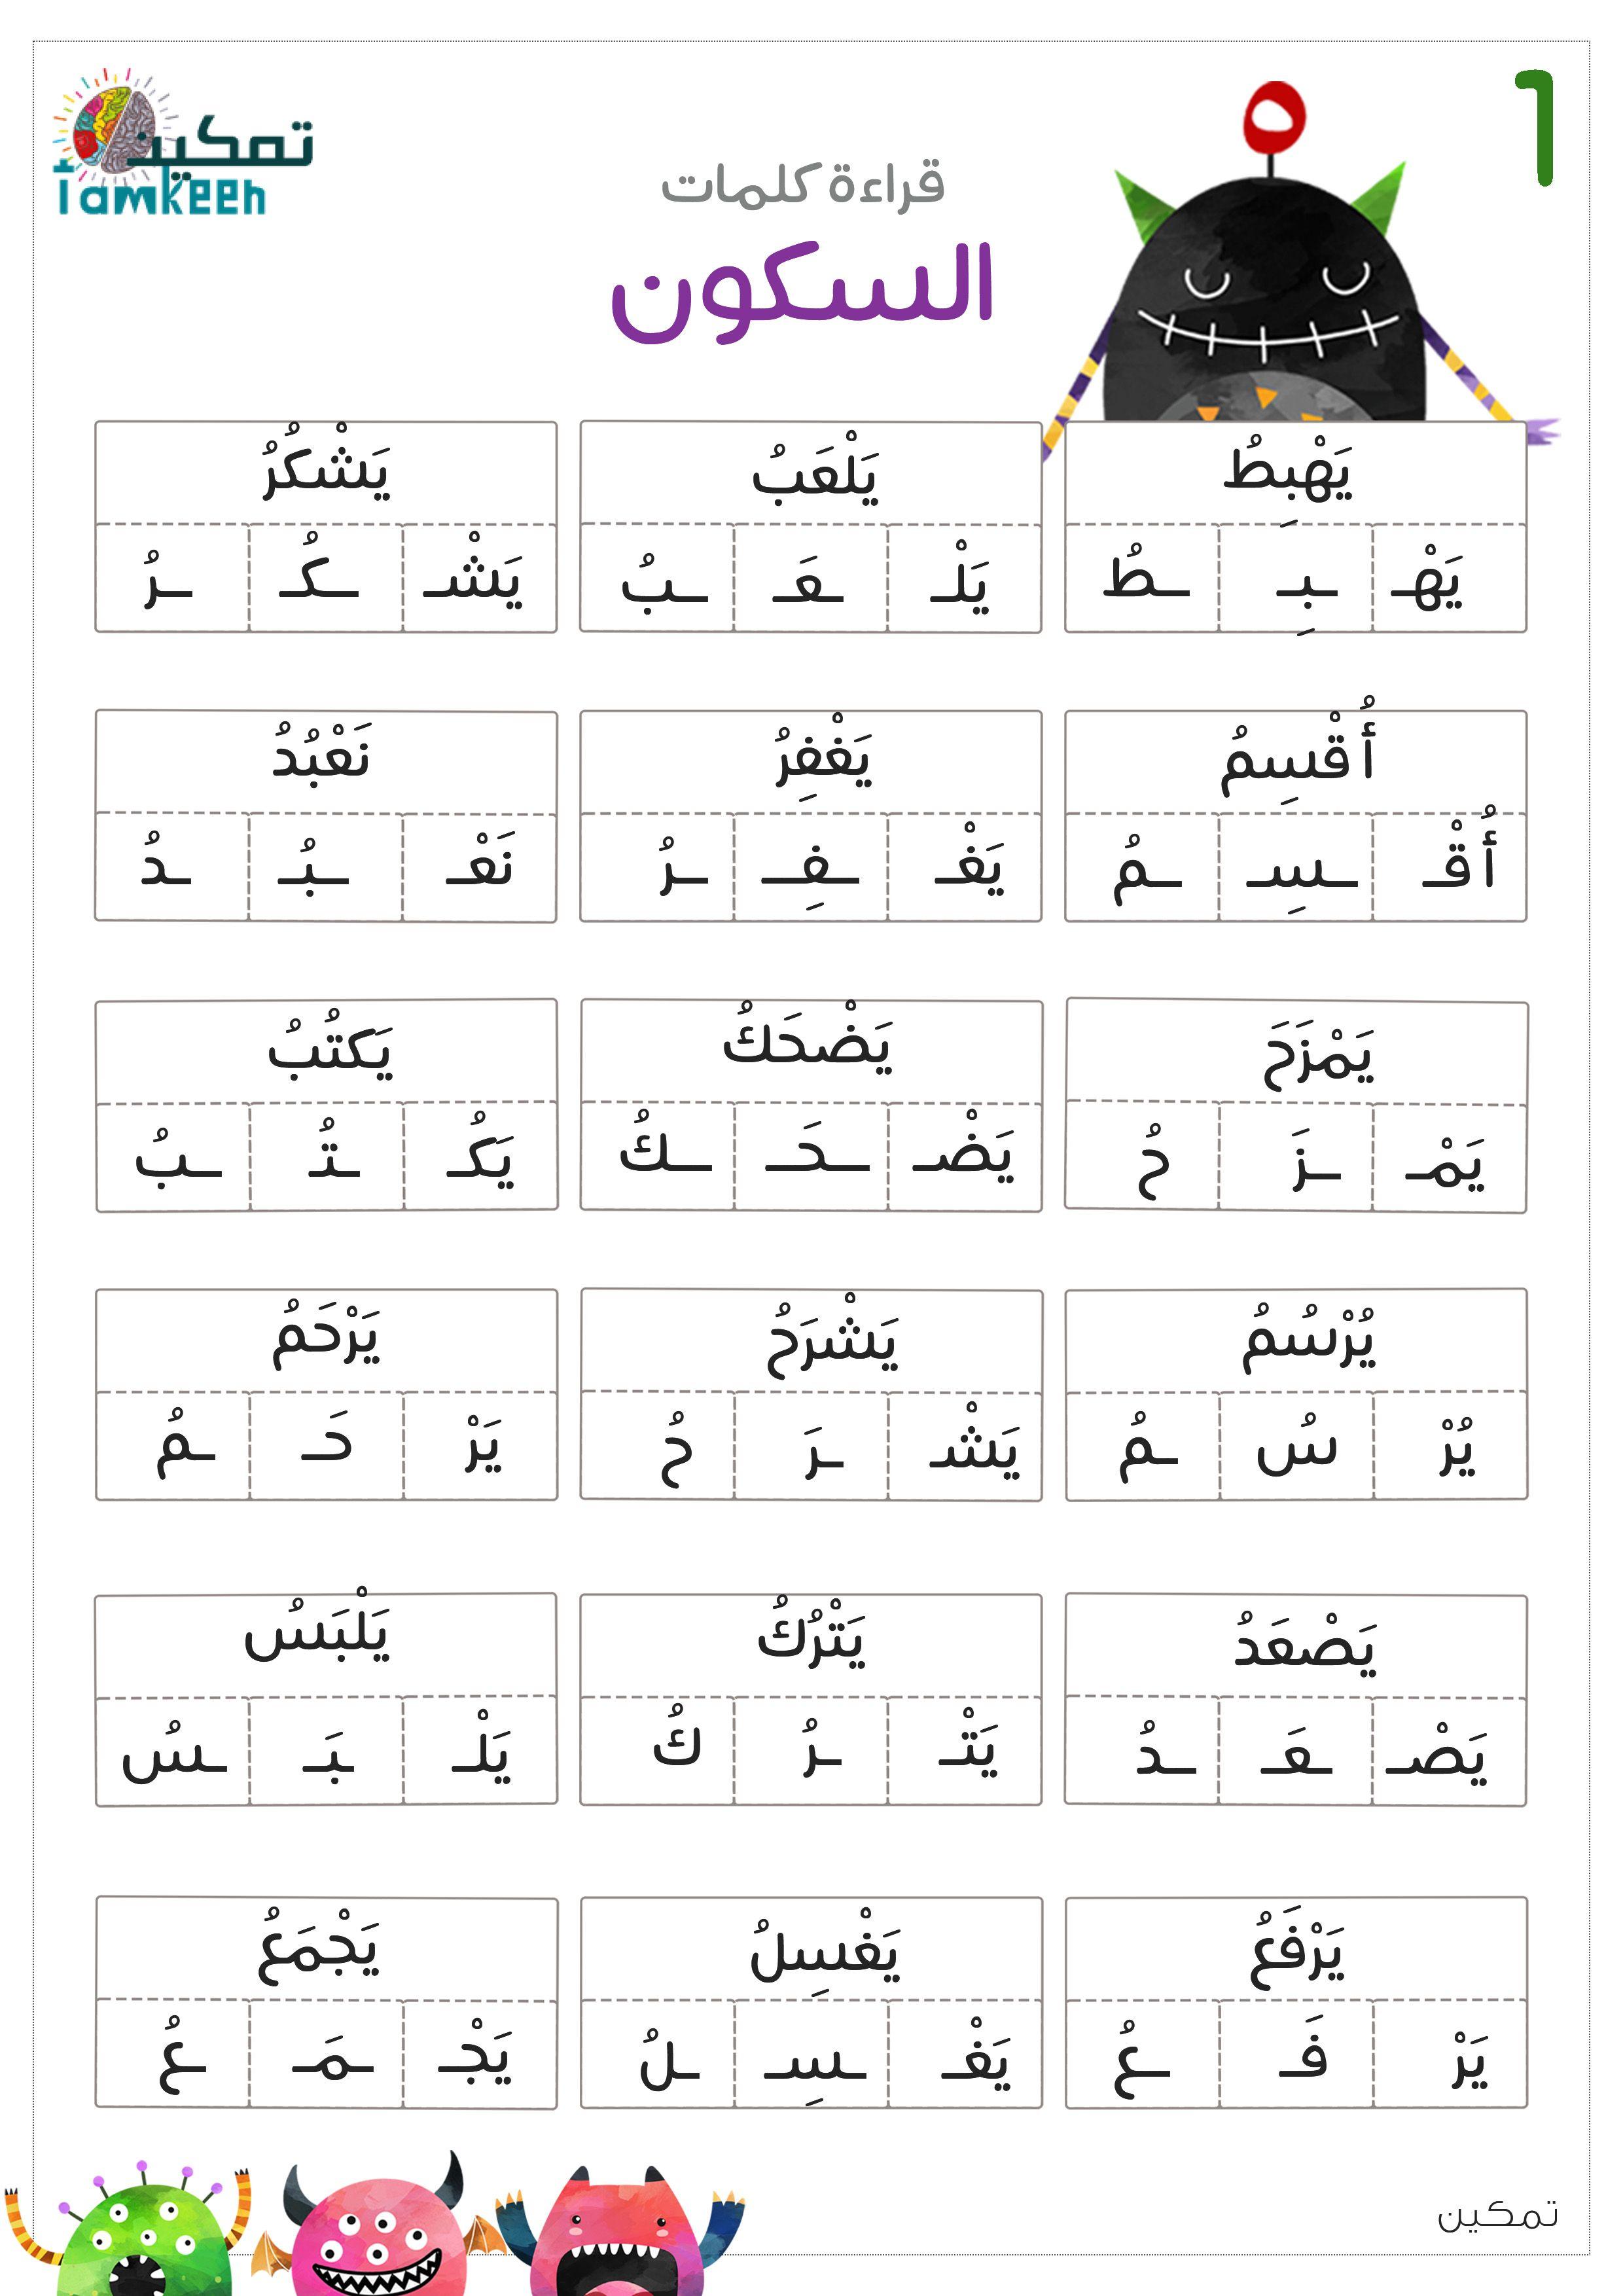 السكون Learning Arabic Arabic Alphabet For Kids Arabic Kids